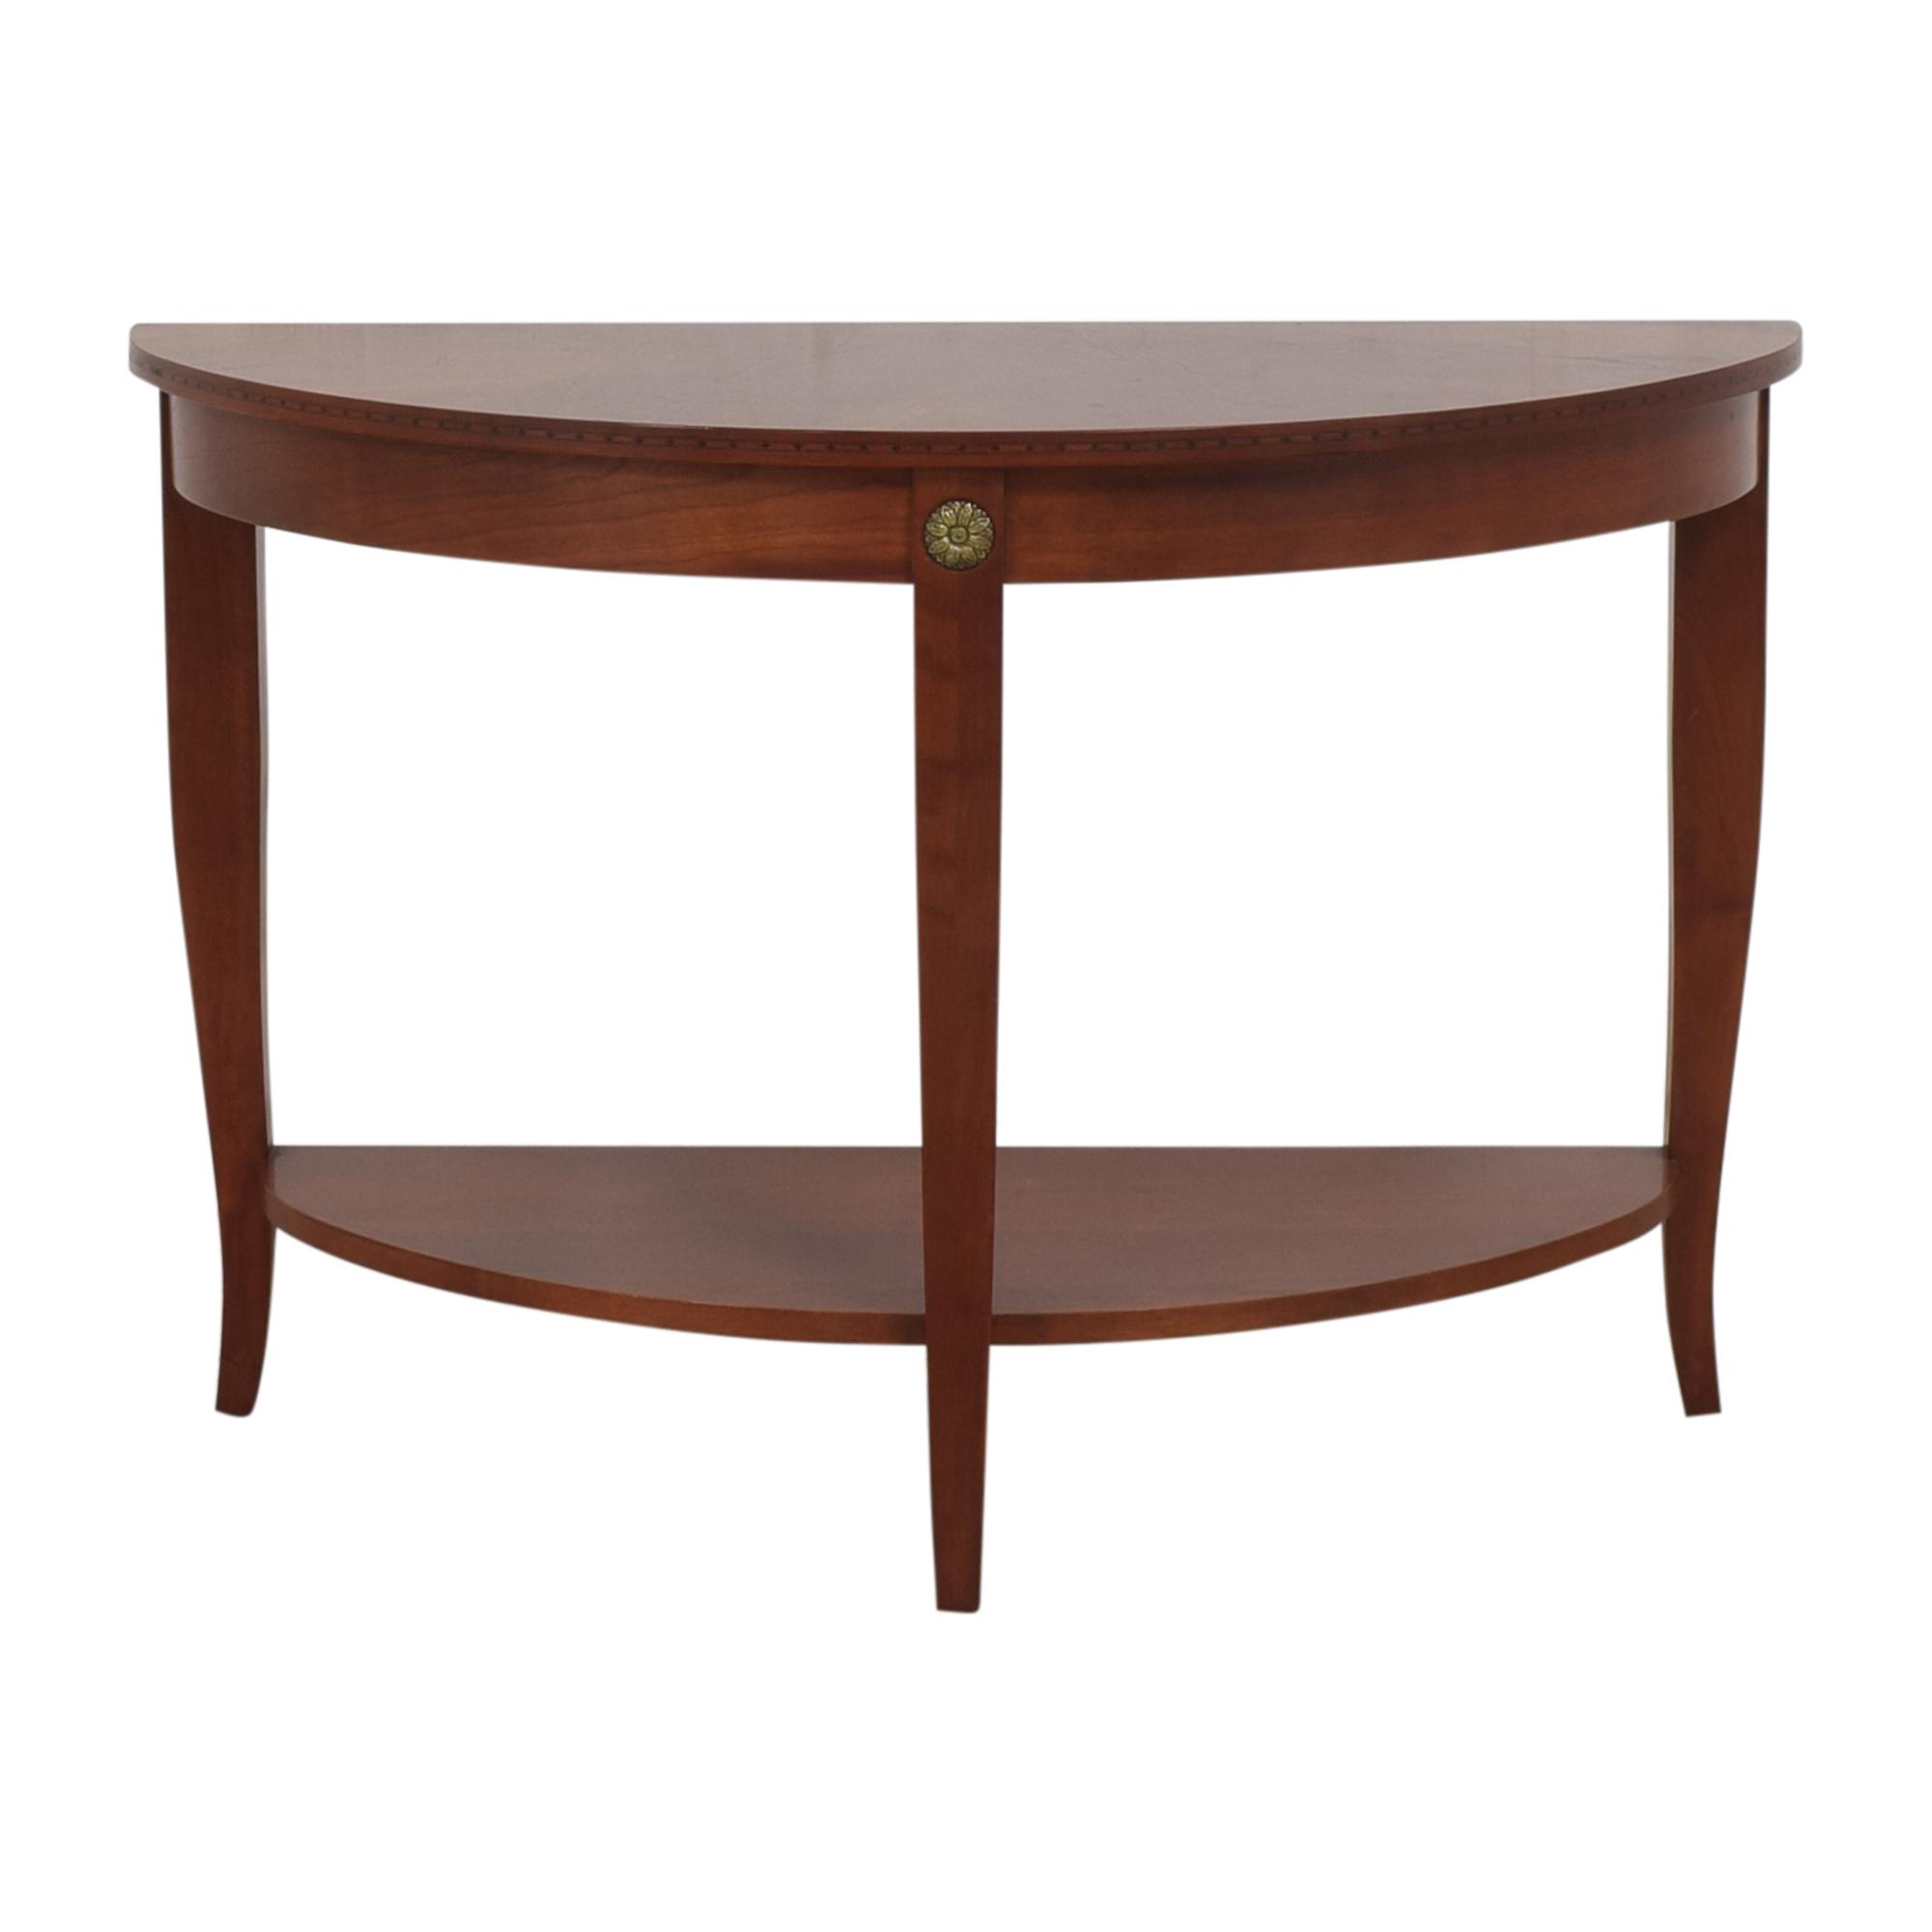 buy Ethan Allen Medallion Crescent Console Table Ethan Allen Tables